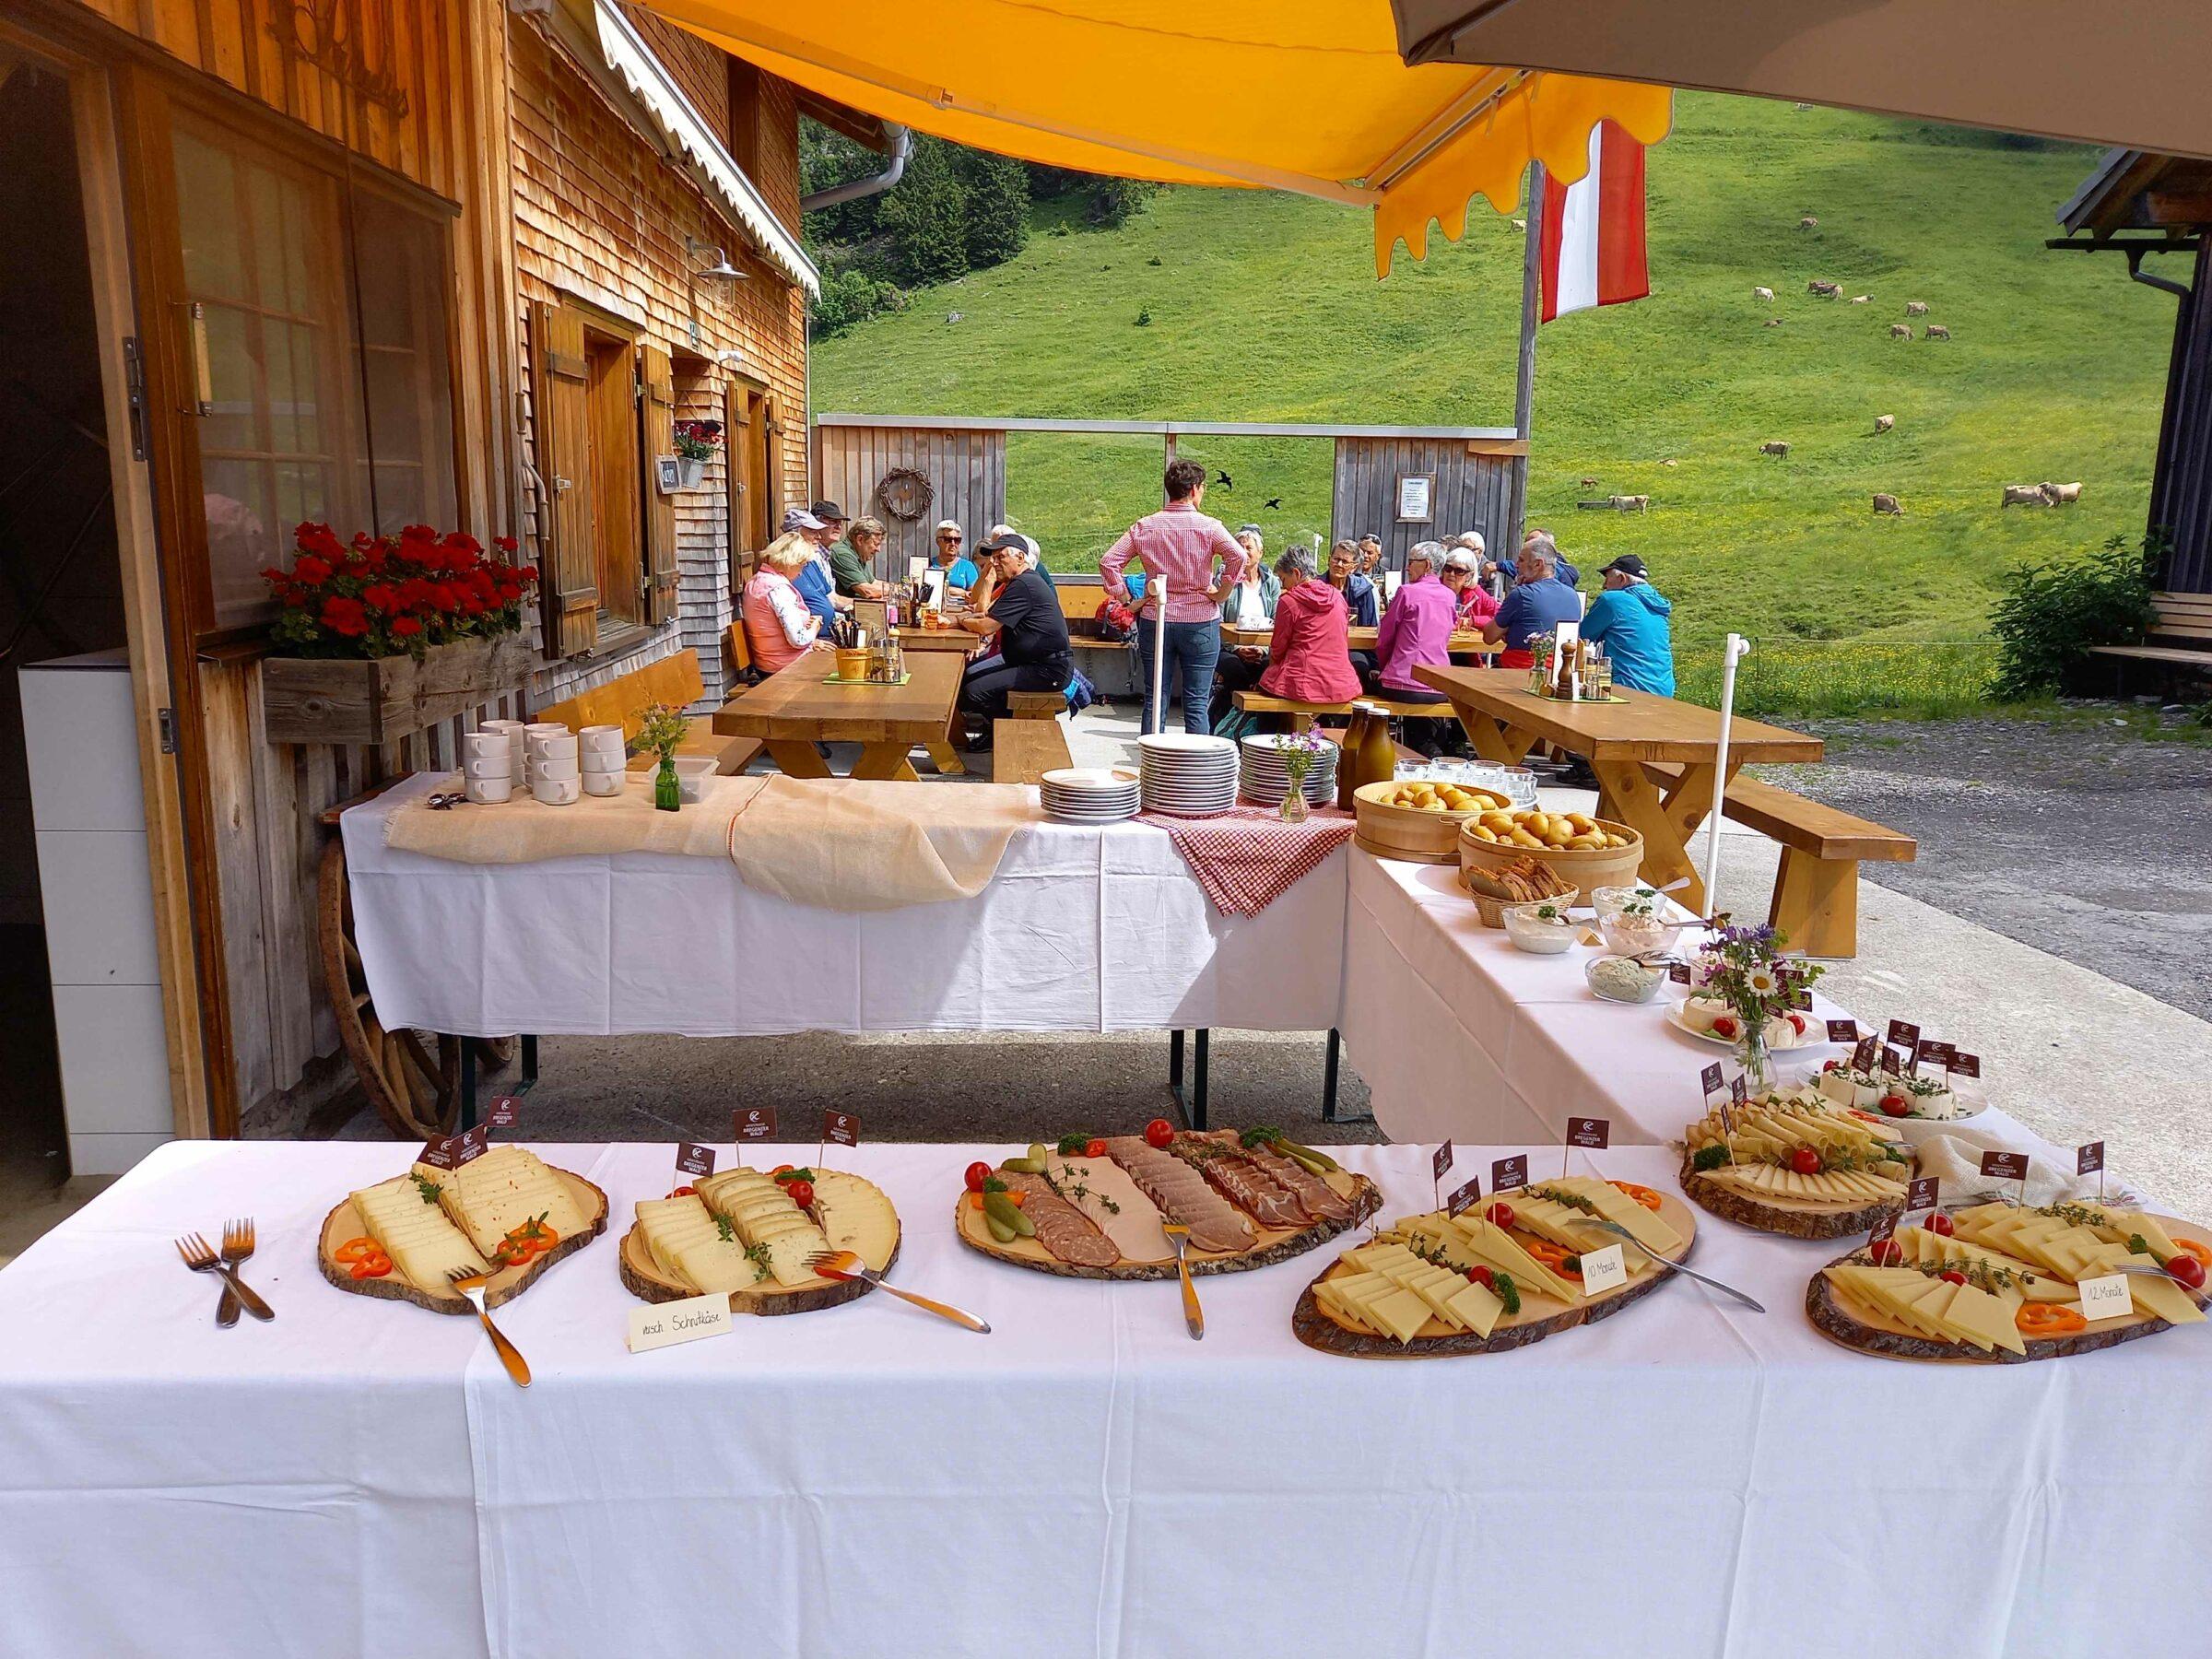 Wanderausflug zur Alpe Kassa-Wildmoos am Freitag, 2.7.2021.